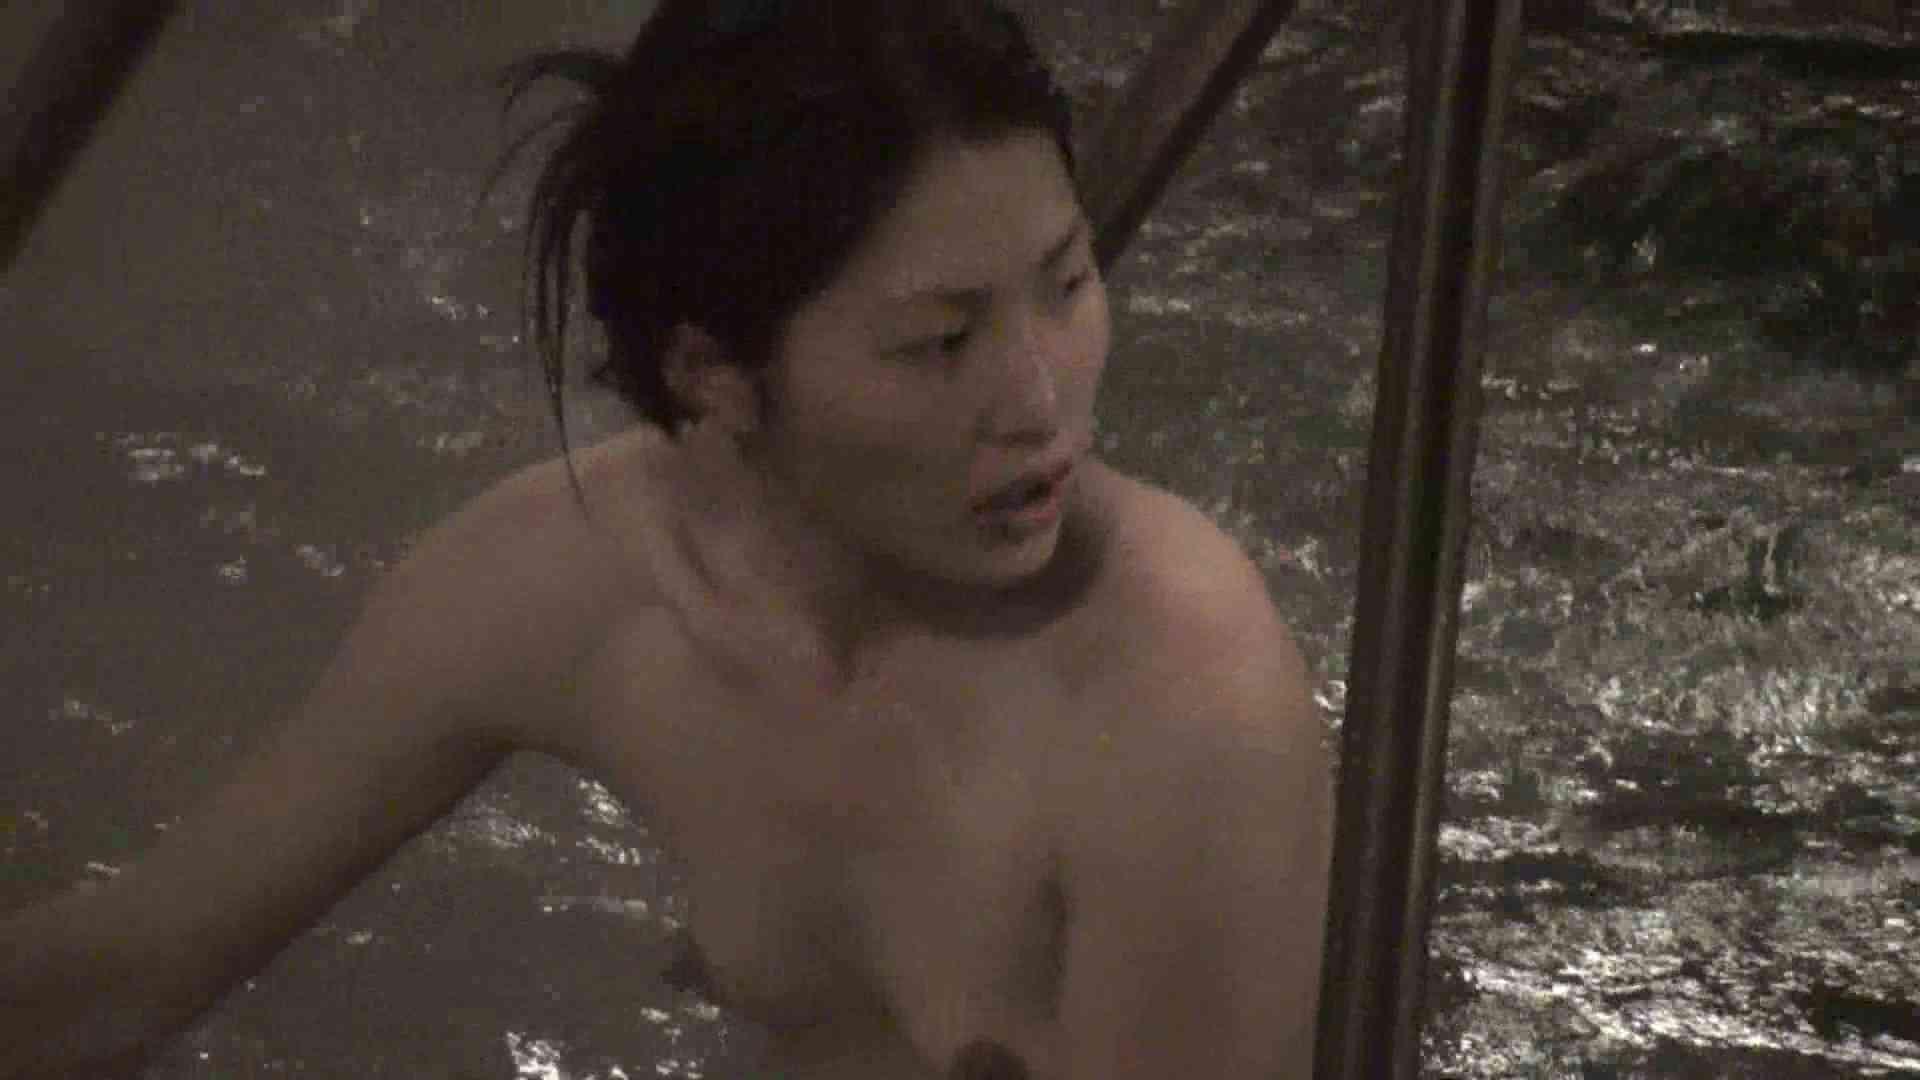 Aquaな露天風呂Vol.406 露天風呂編  91PIX 34